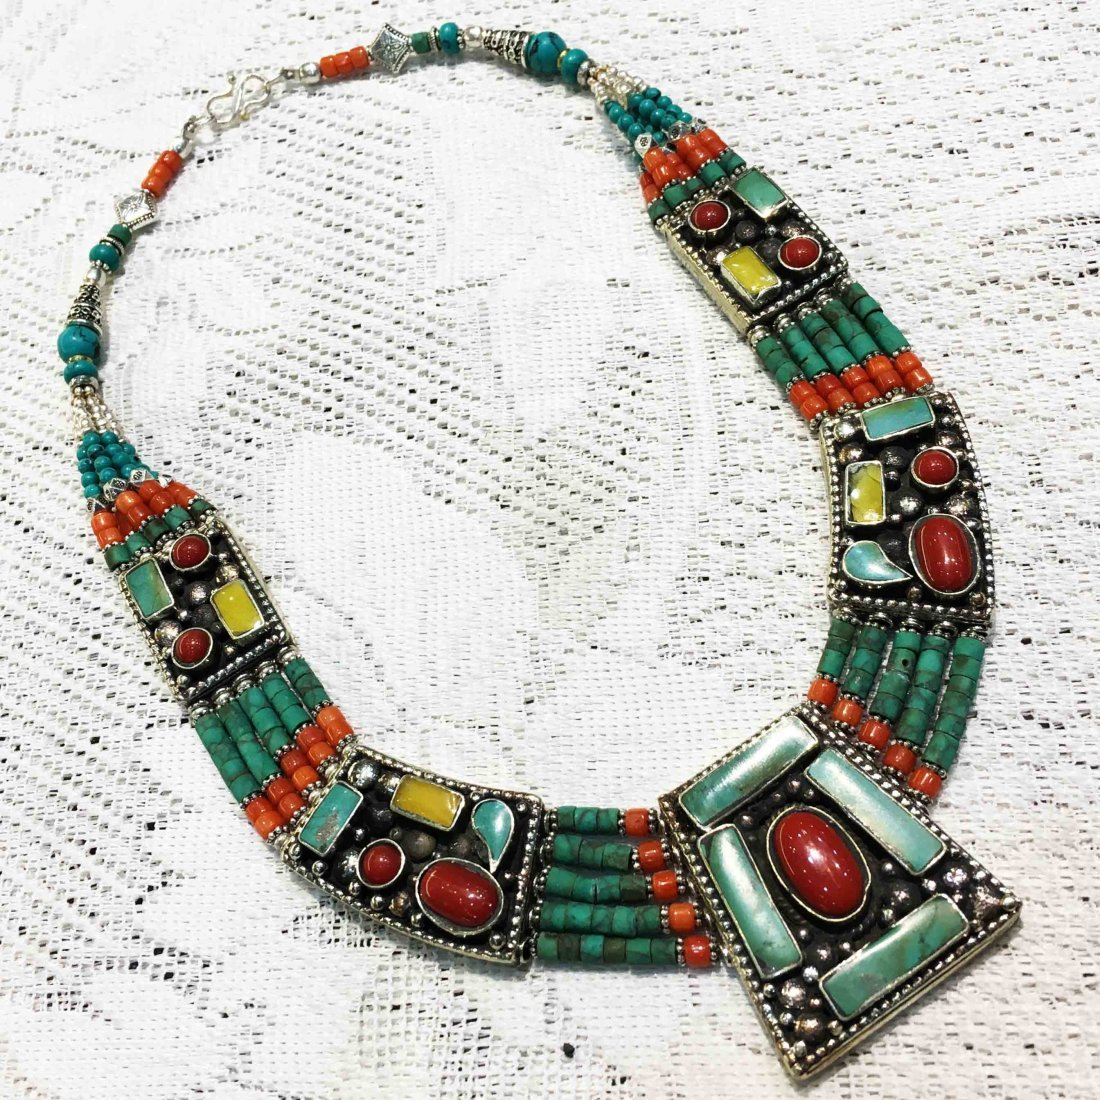 Buddhist Amber & Coral Vintage Handmade Necklace